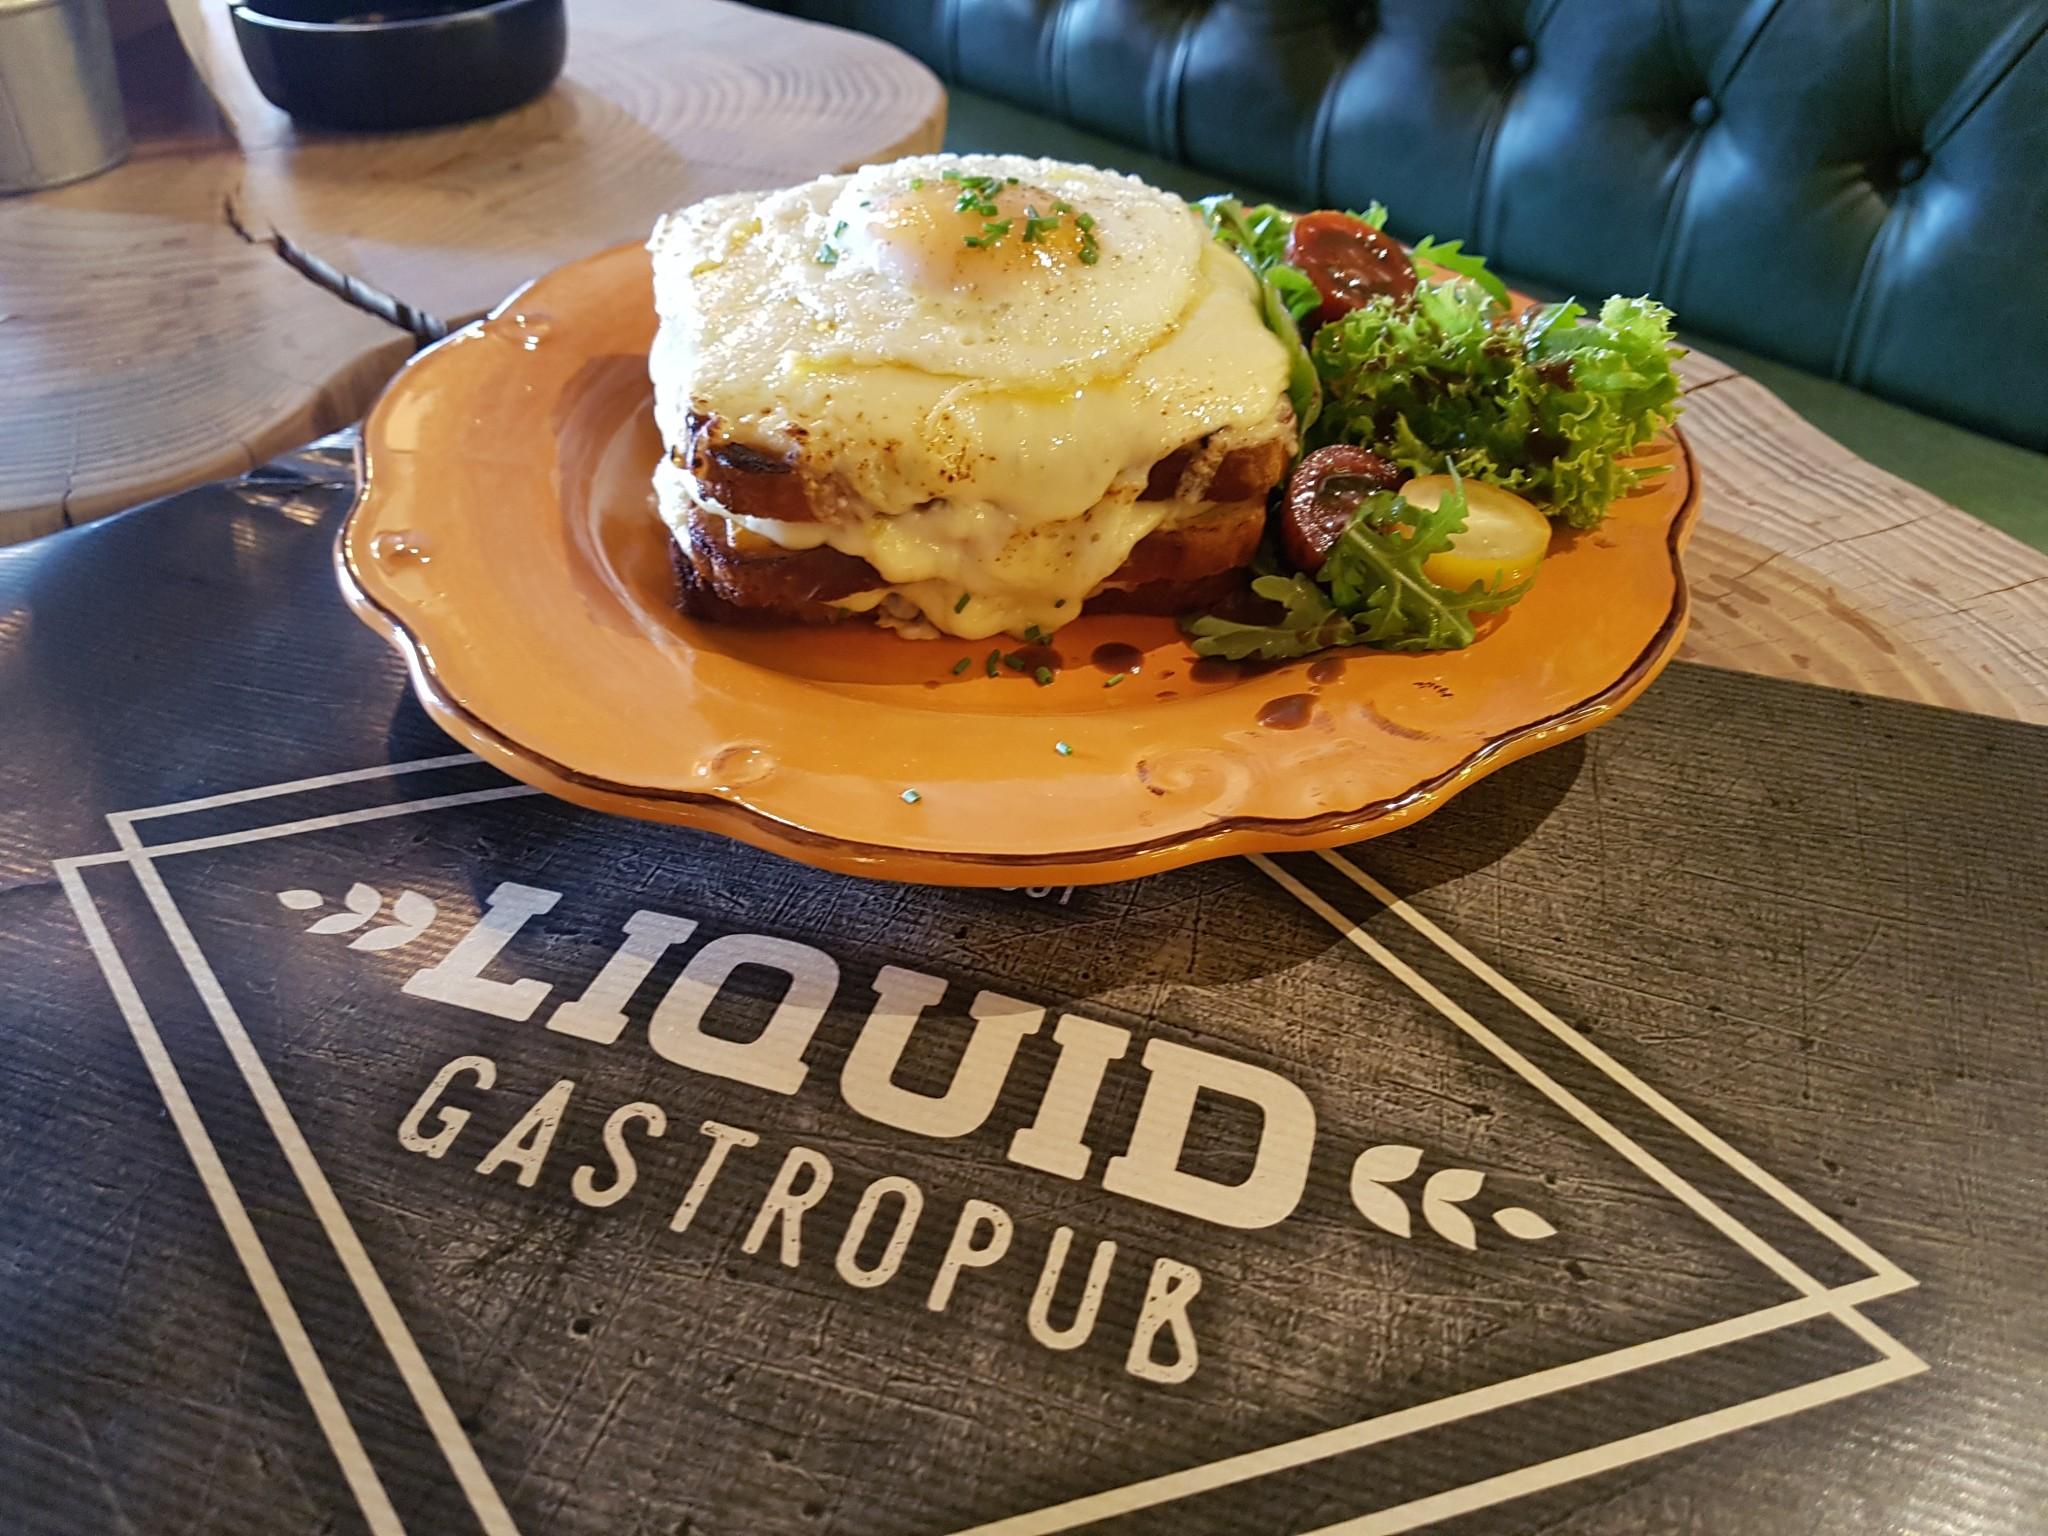 Croque madame by liquid gastropub